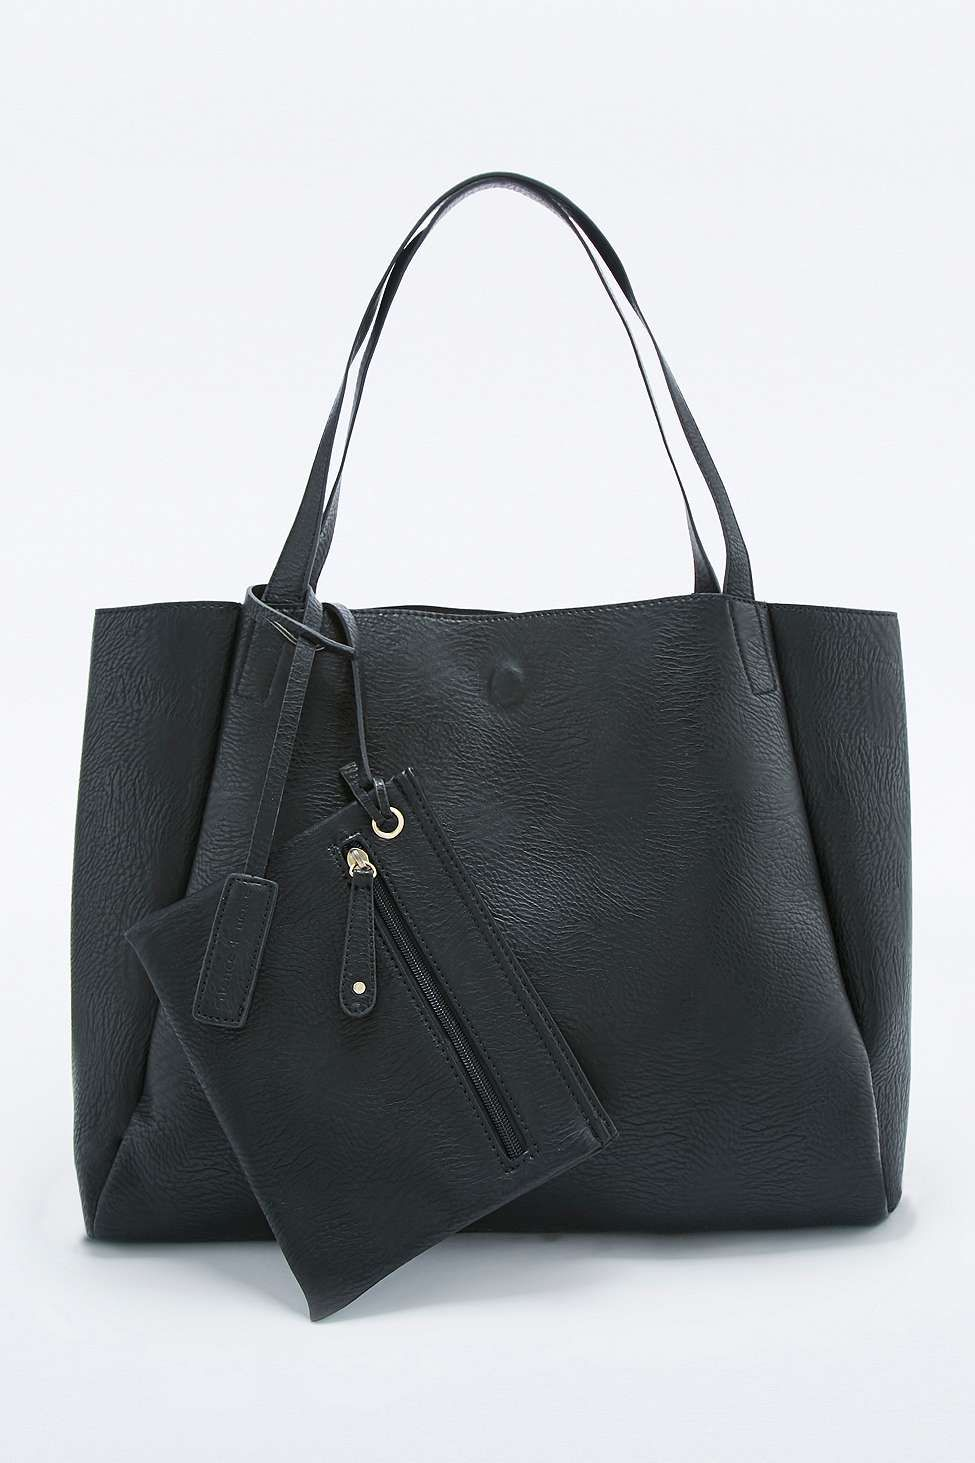 5c4f82ef34b8 Modern Black Vegan Leather Tote Bag   Pay day treats   Pinterest ...